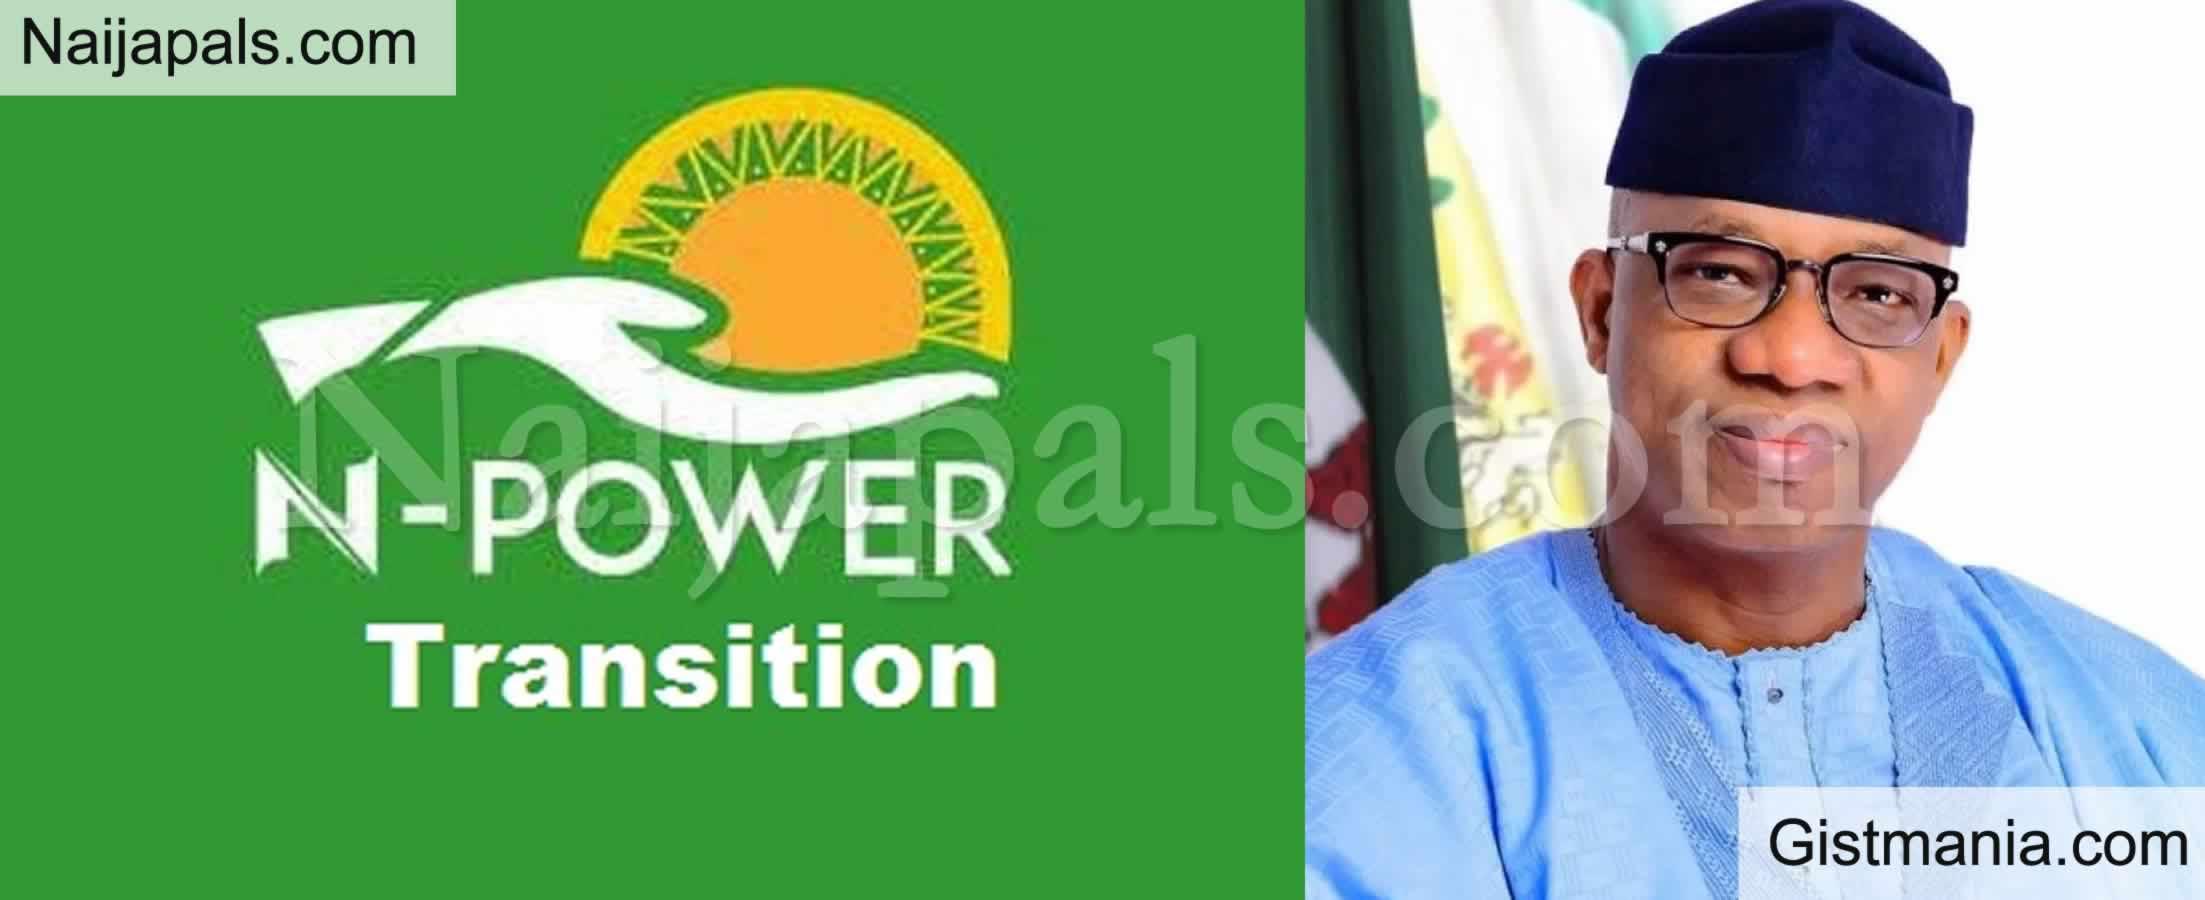 <img alt='.' class='lazyload' data-src='https://img.gistmania.com/emot/news.gif' /> <b>Ogun State NUT Urges Governor Abiodun To Reabsorb Recently Disengaged Npower Teachers</b>